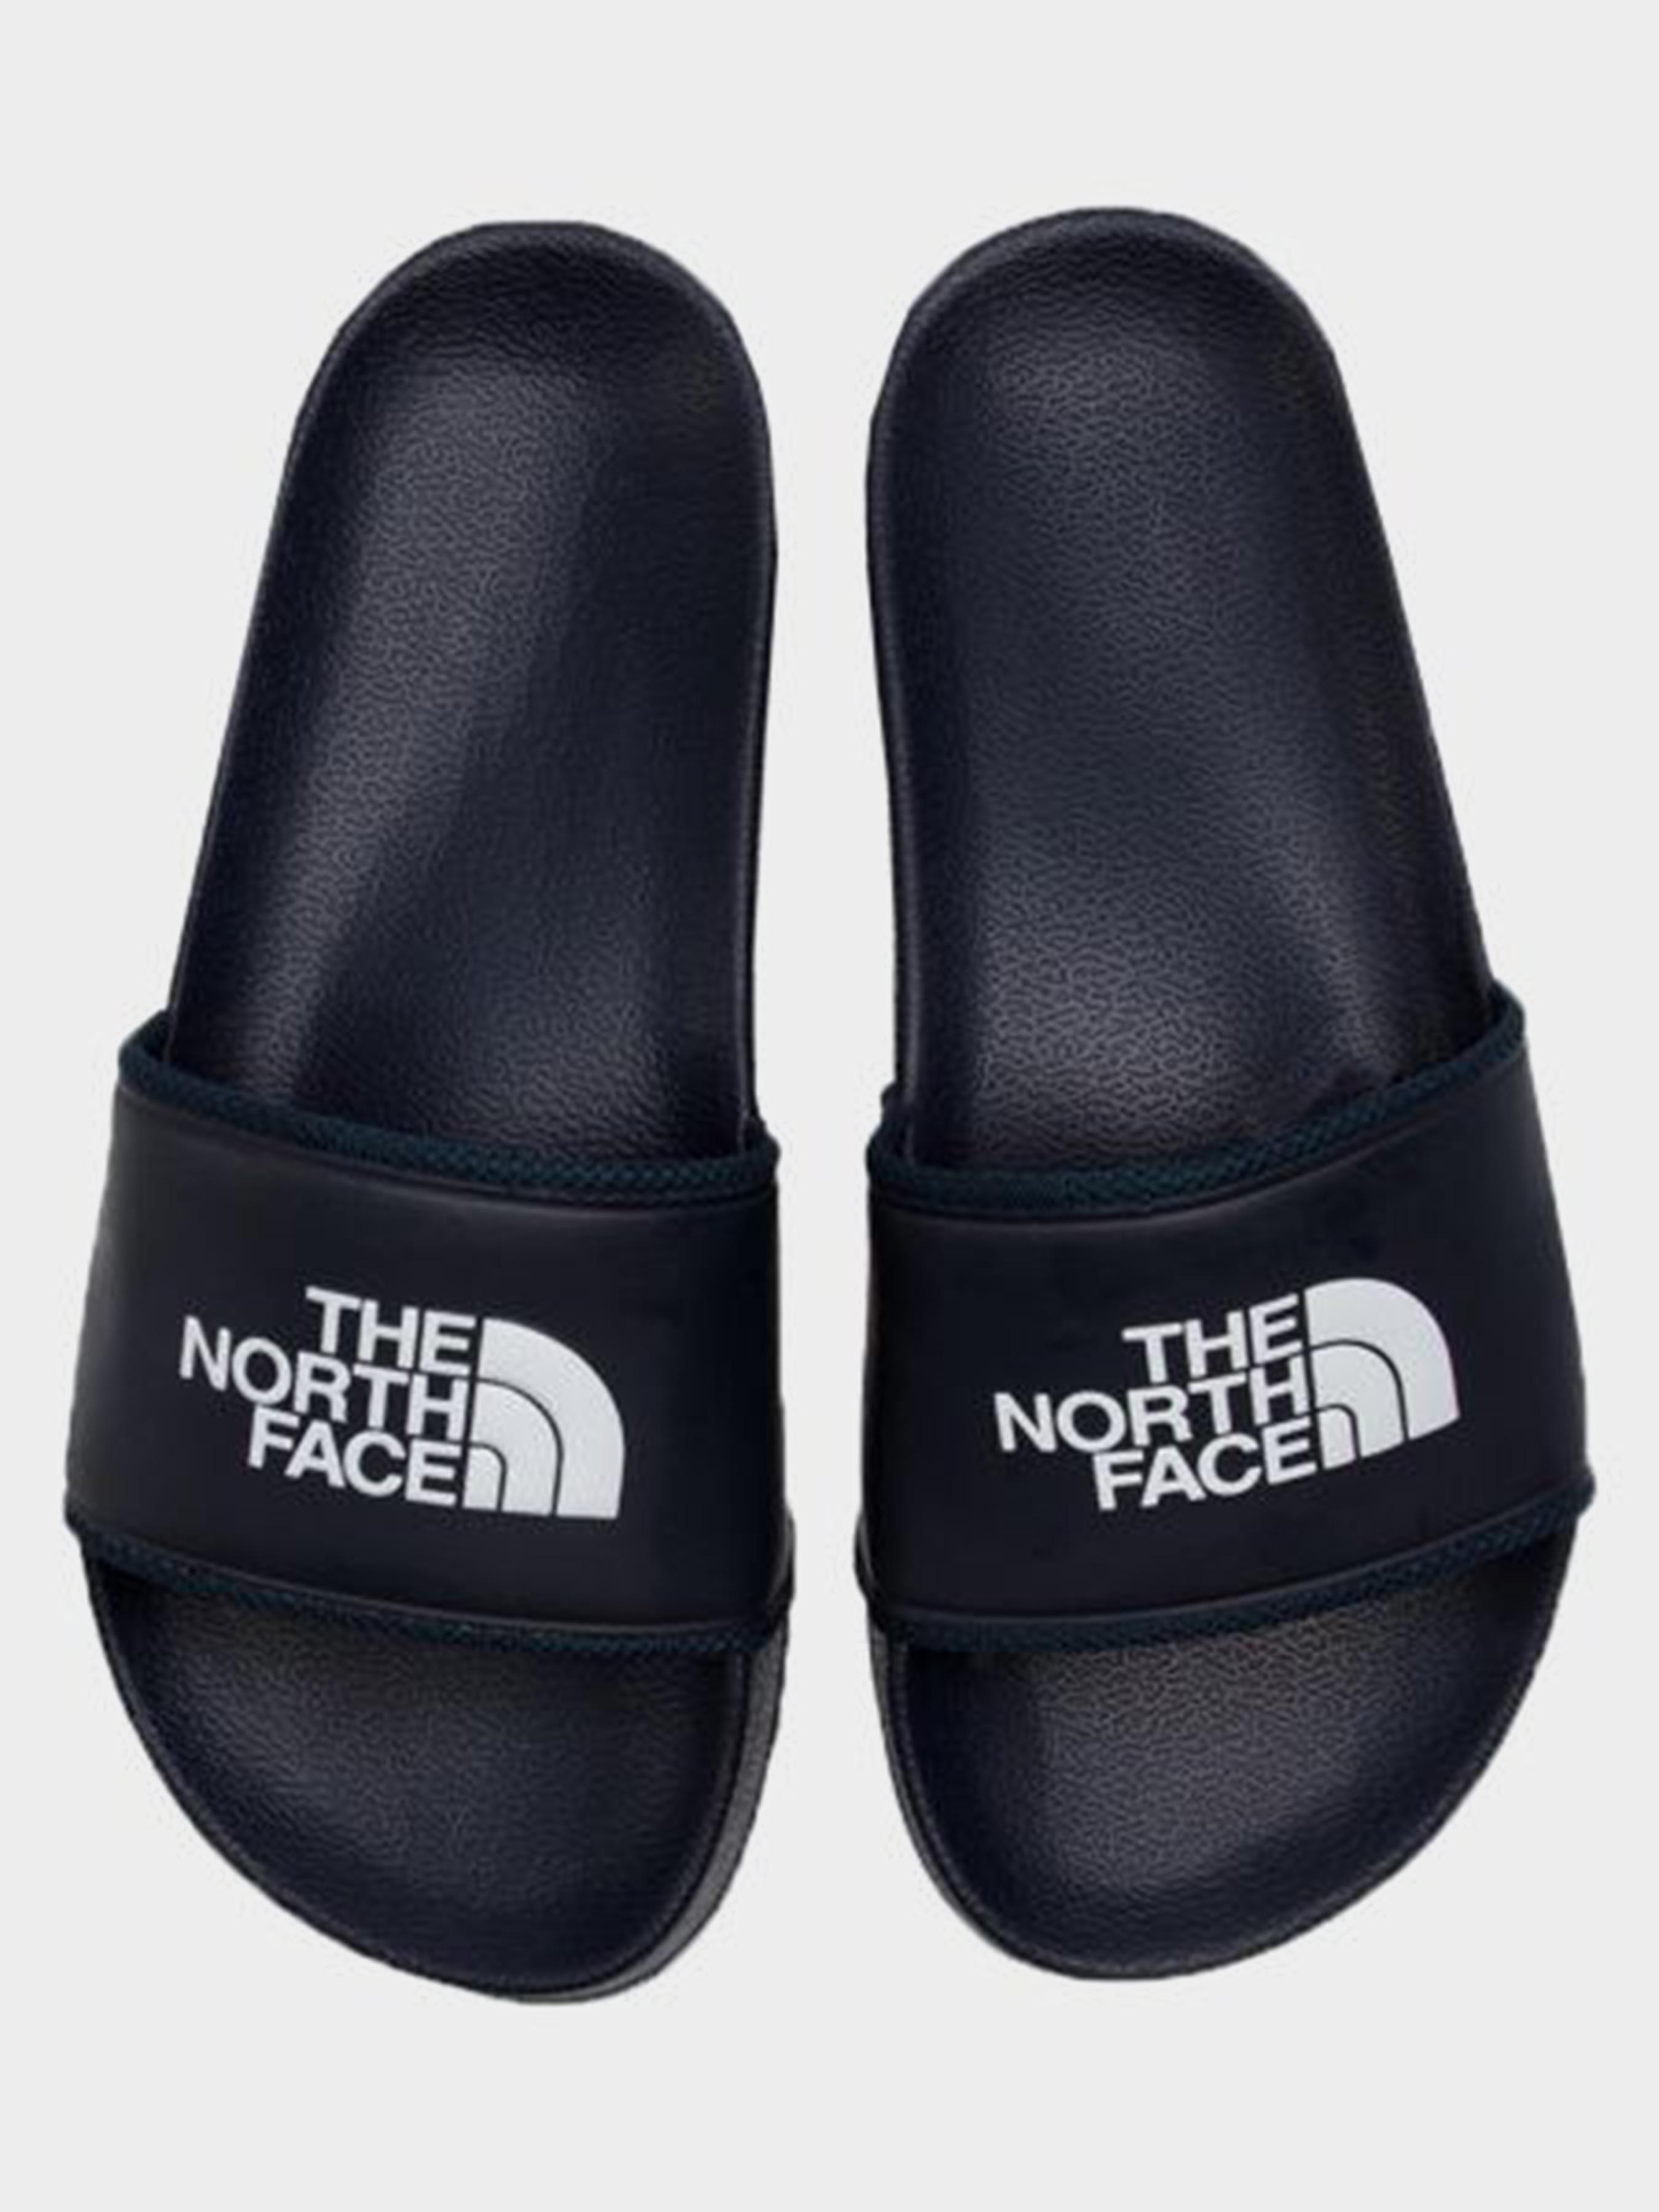 Купить Шлёпанцы мужские The North Face BC SLIDE II NT89, Черный